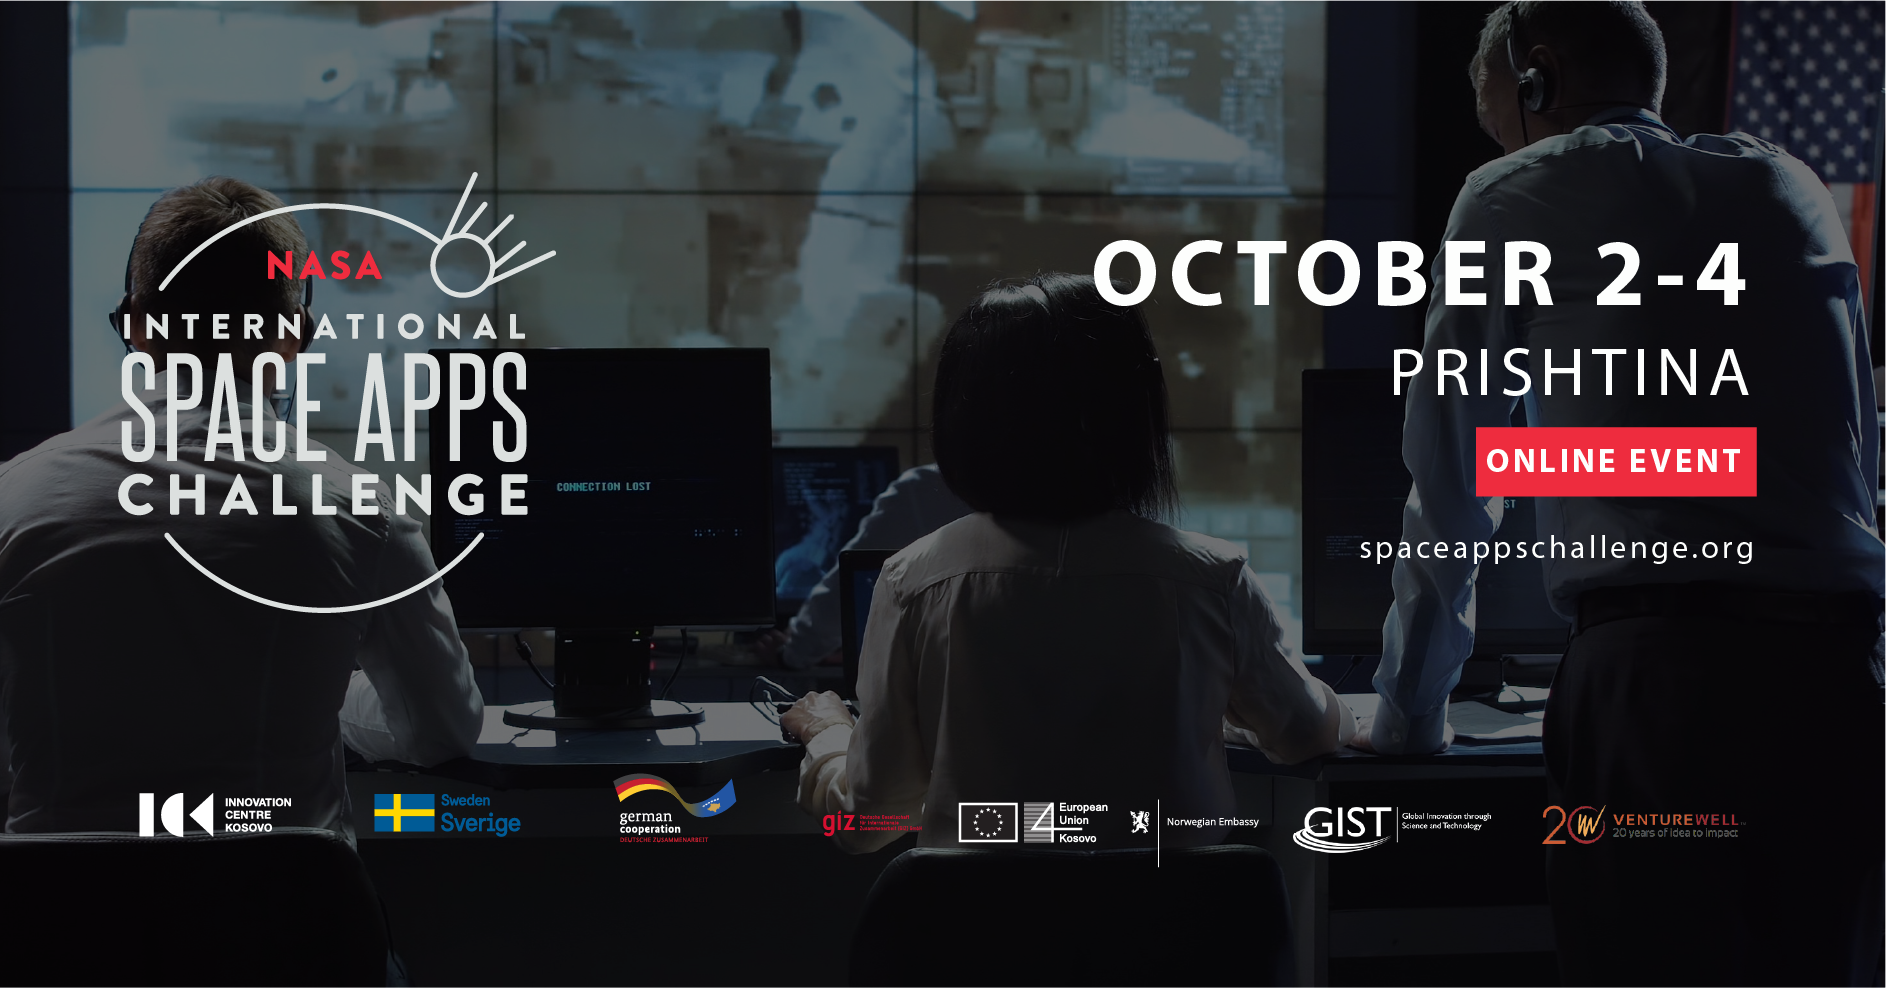 NASA Space Apps Challenge Prishtina (Online)